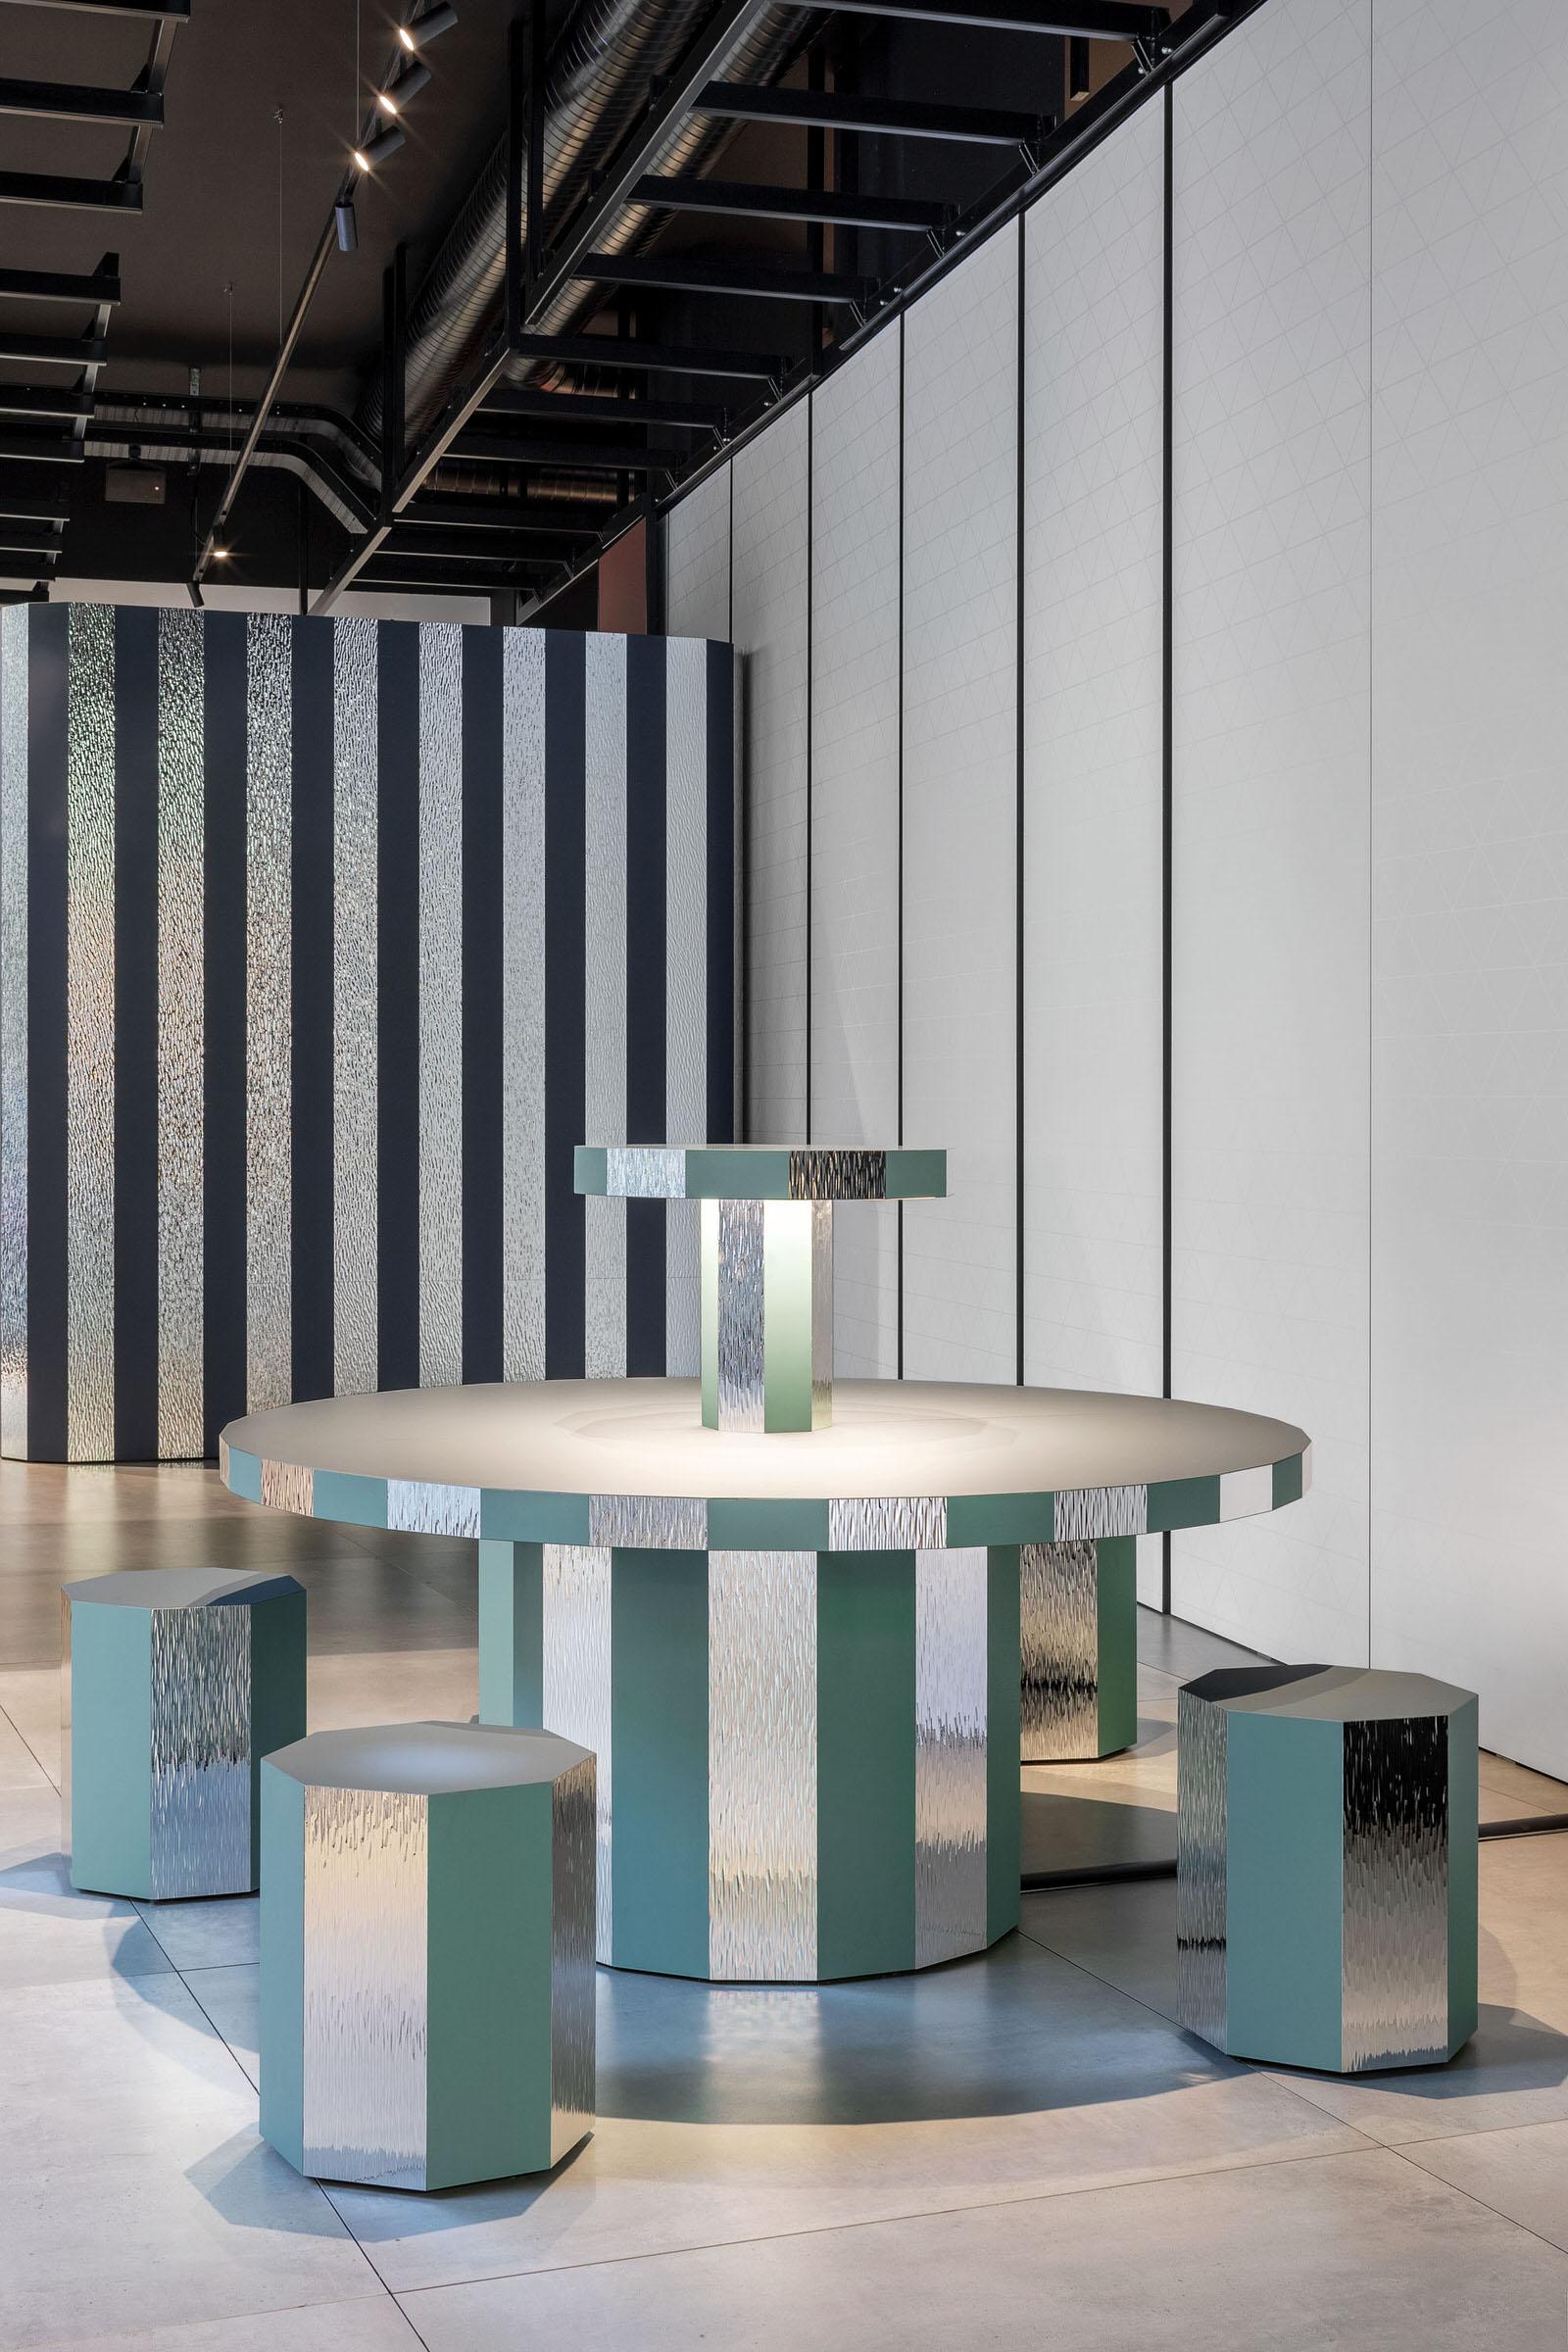 Yellowtrace Milan Design Week 2021 Materiorama Constance Guisset Fenix Scenario 01